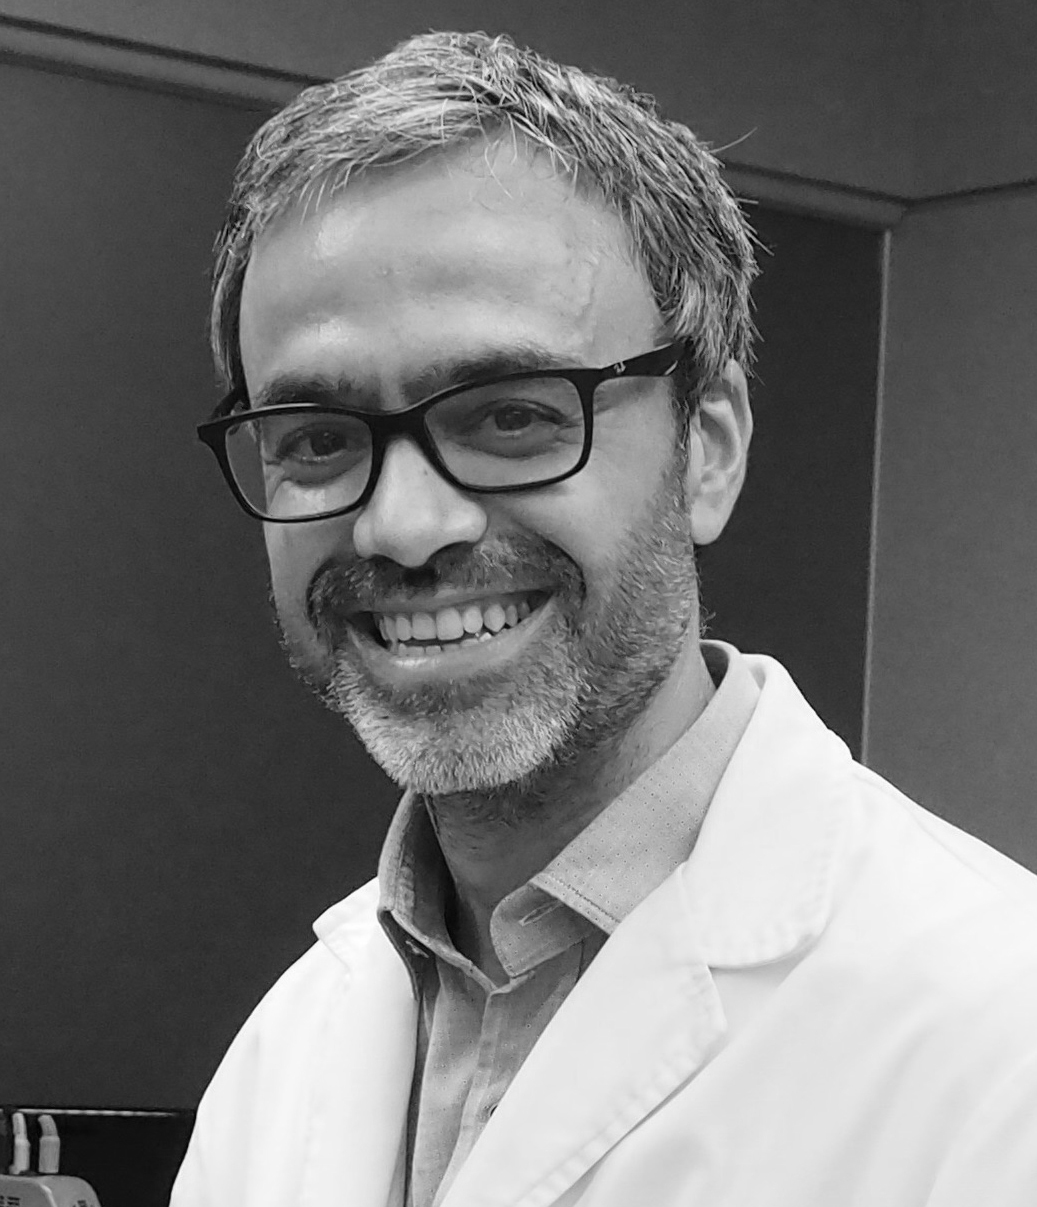 Dr. Gaspar Mestres Alomar